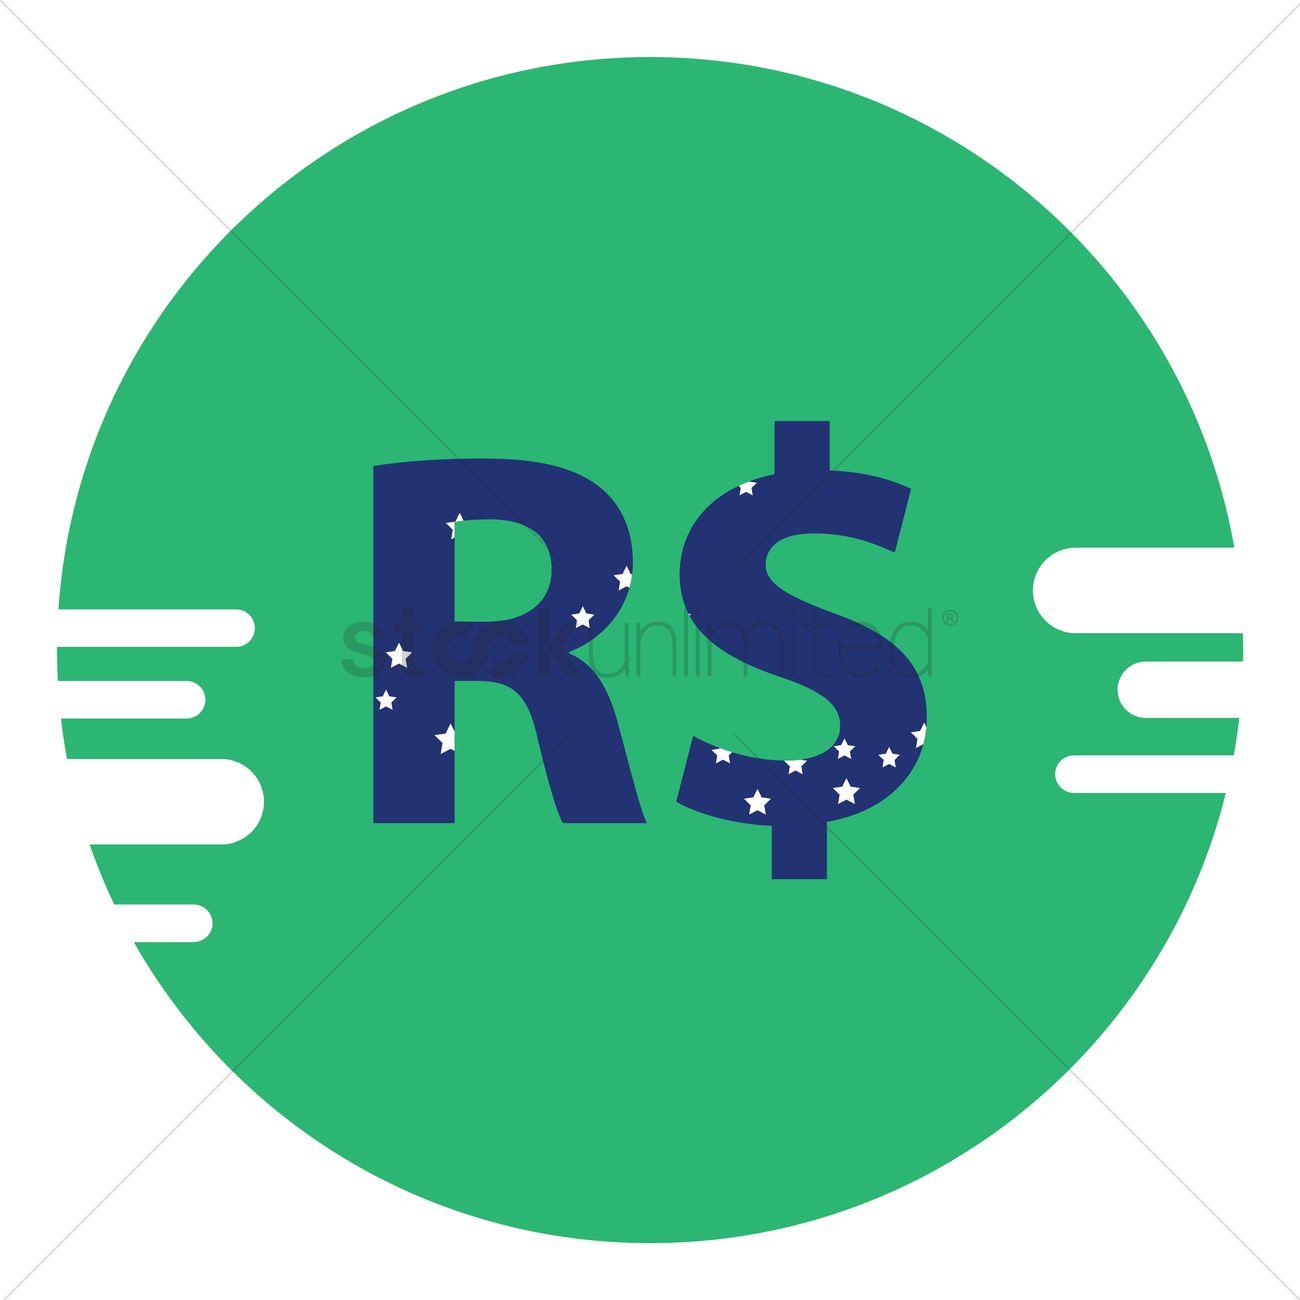 Brazilian Real Symbol Vector Image 1572790 Stockunlimited